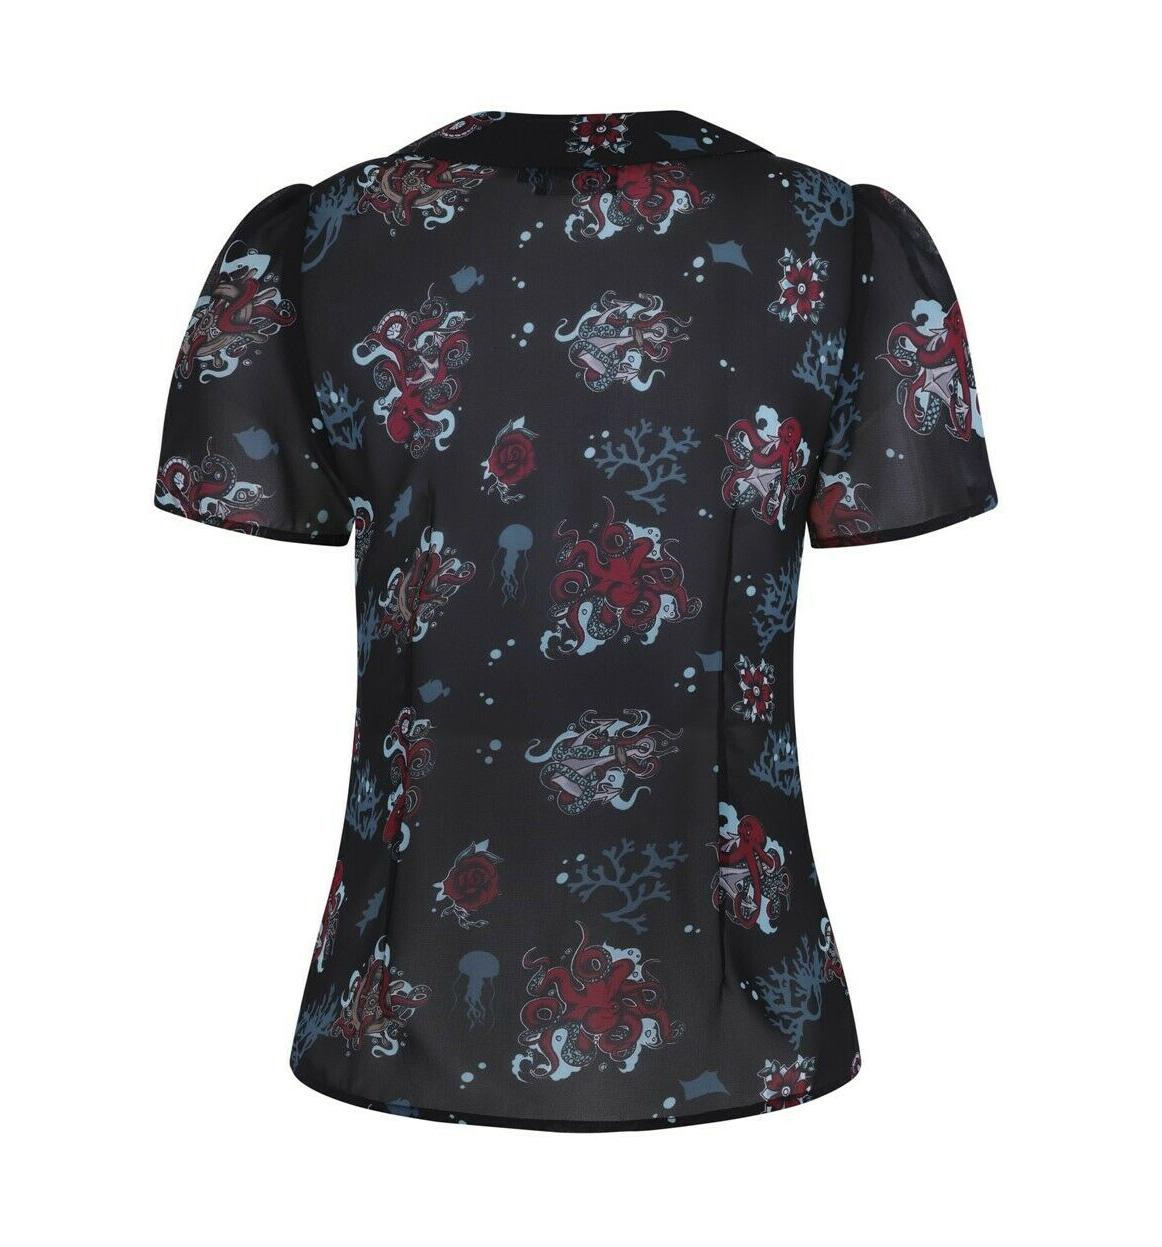 Hell-Bunny-50s-Shirt-Top-Black-Ocean-Octopus-Roses-POSEIDON-Blouse-All-Sizes thumbnail 49